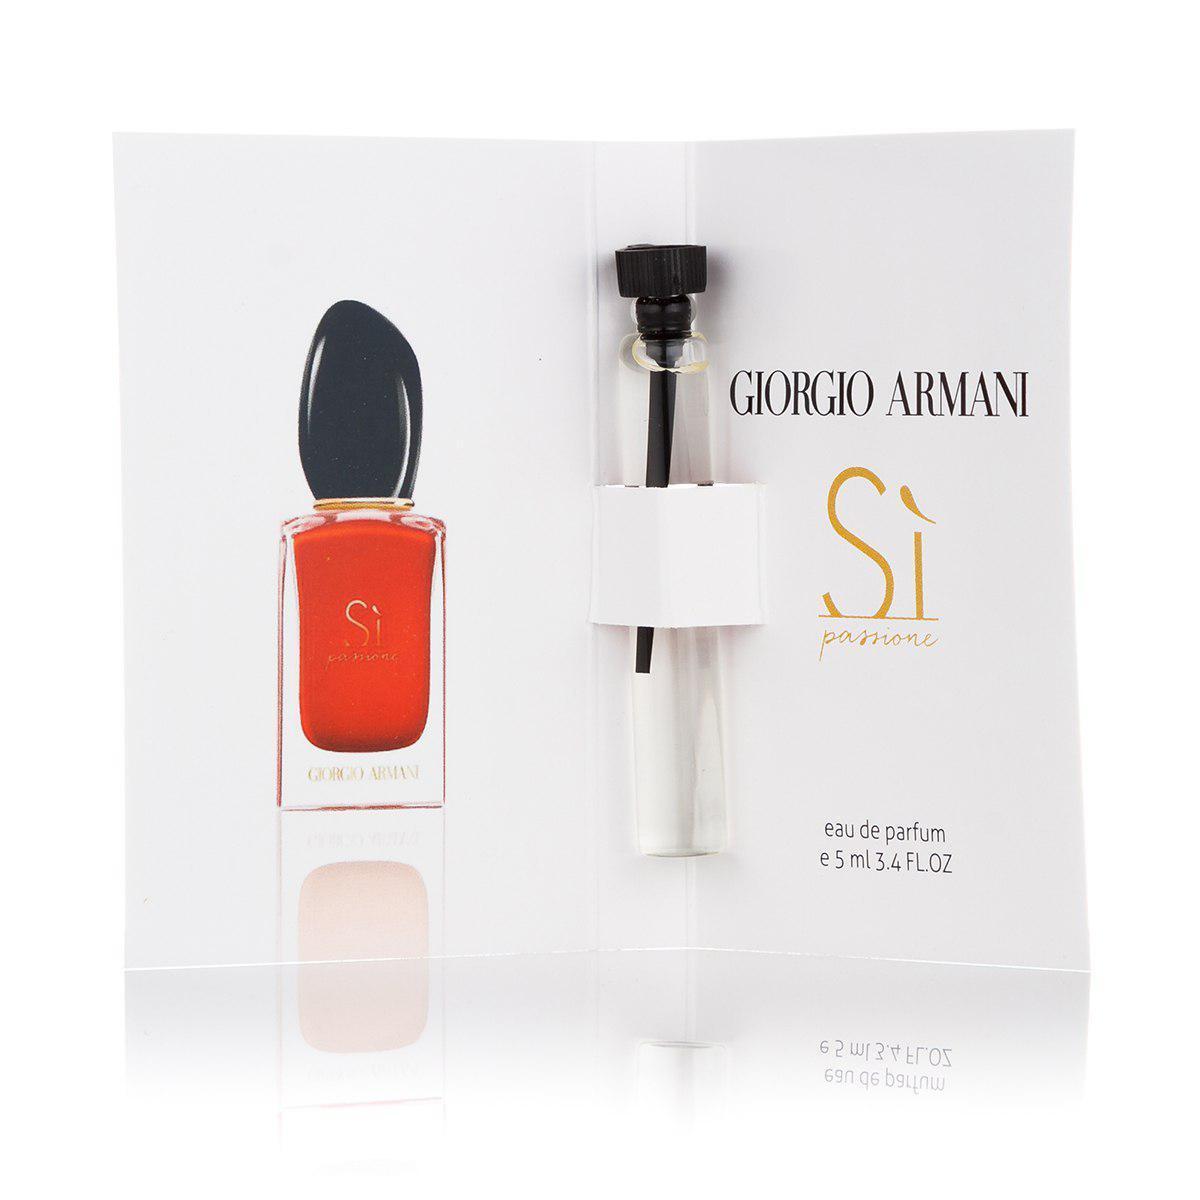 Женская парфюмированная вода Giorgio Аrmani si Passione пробник 5 мл (реплика)